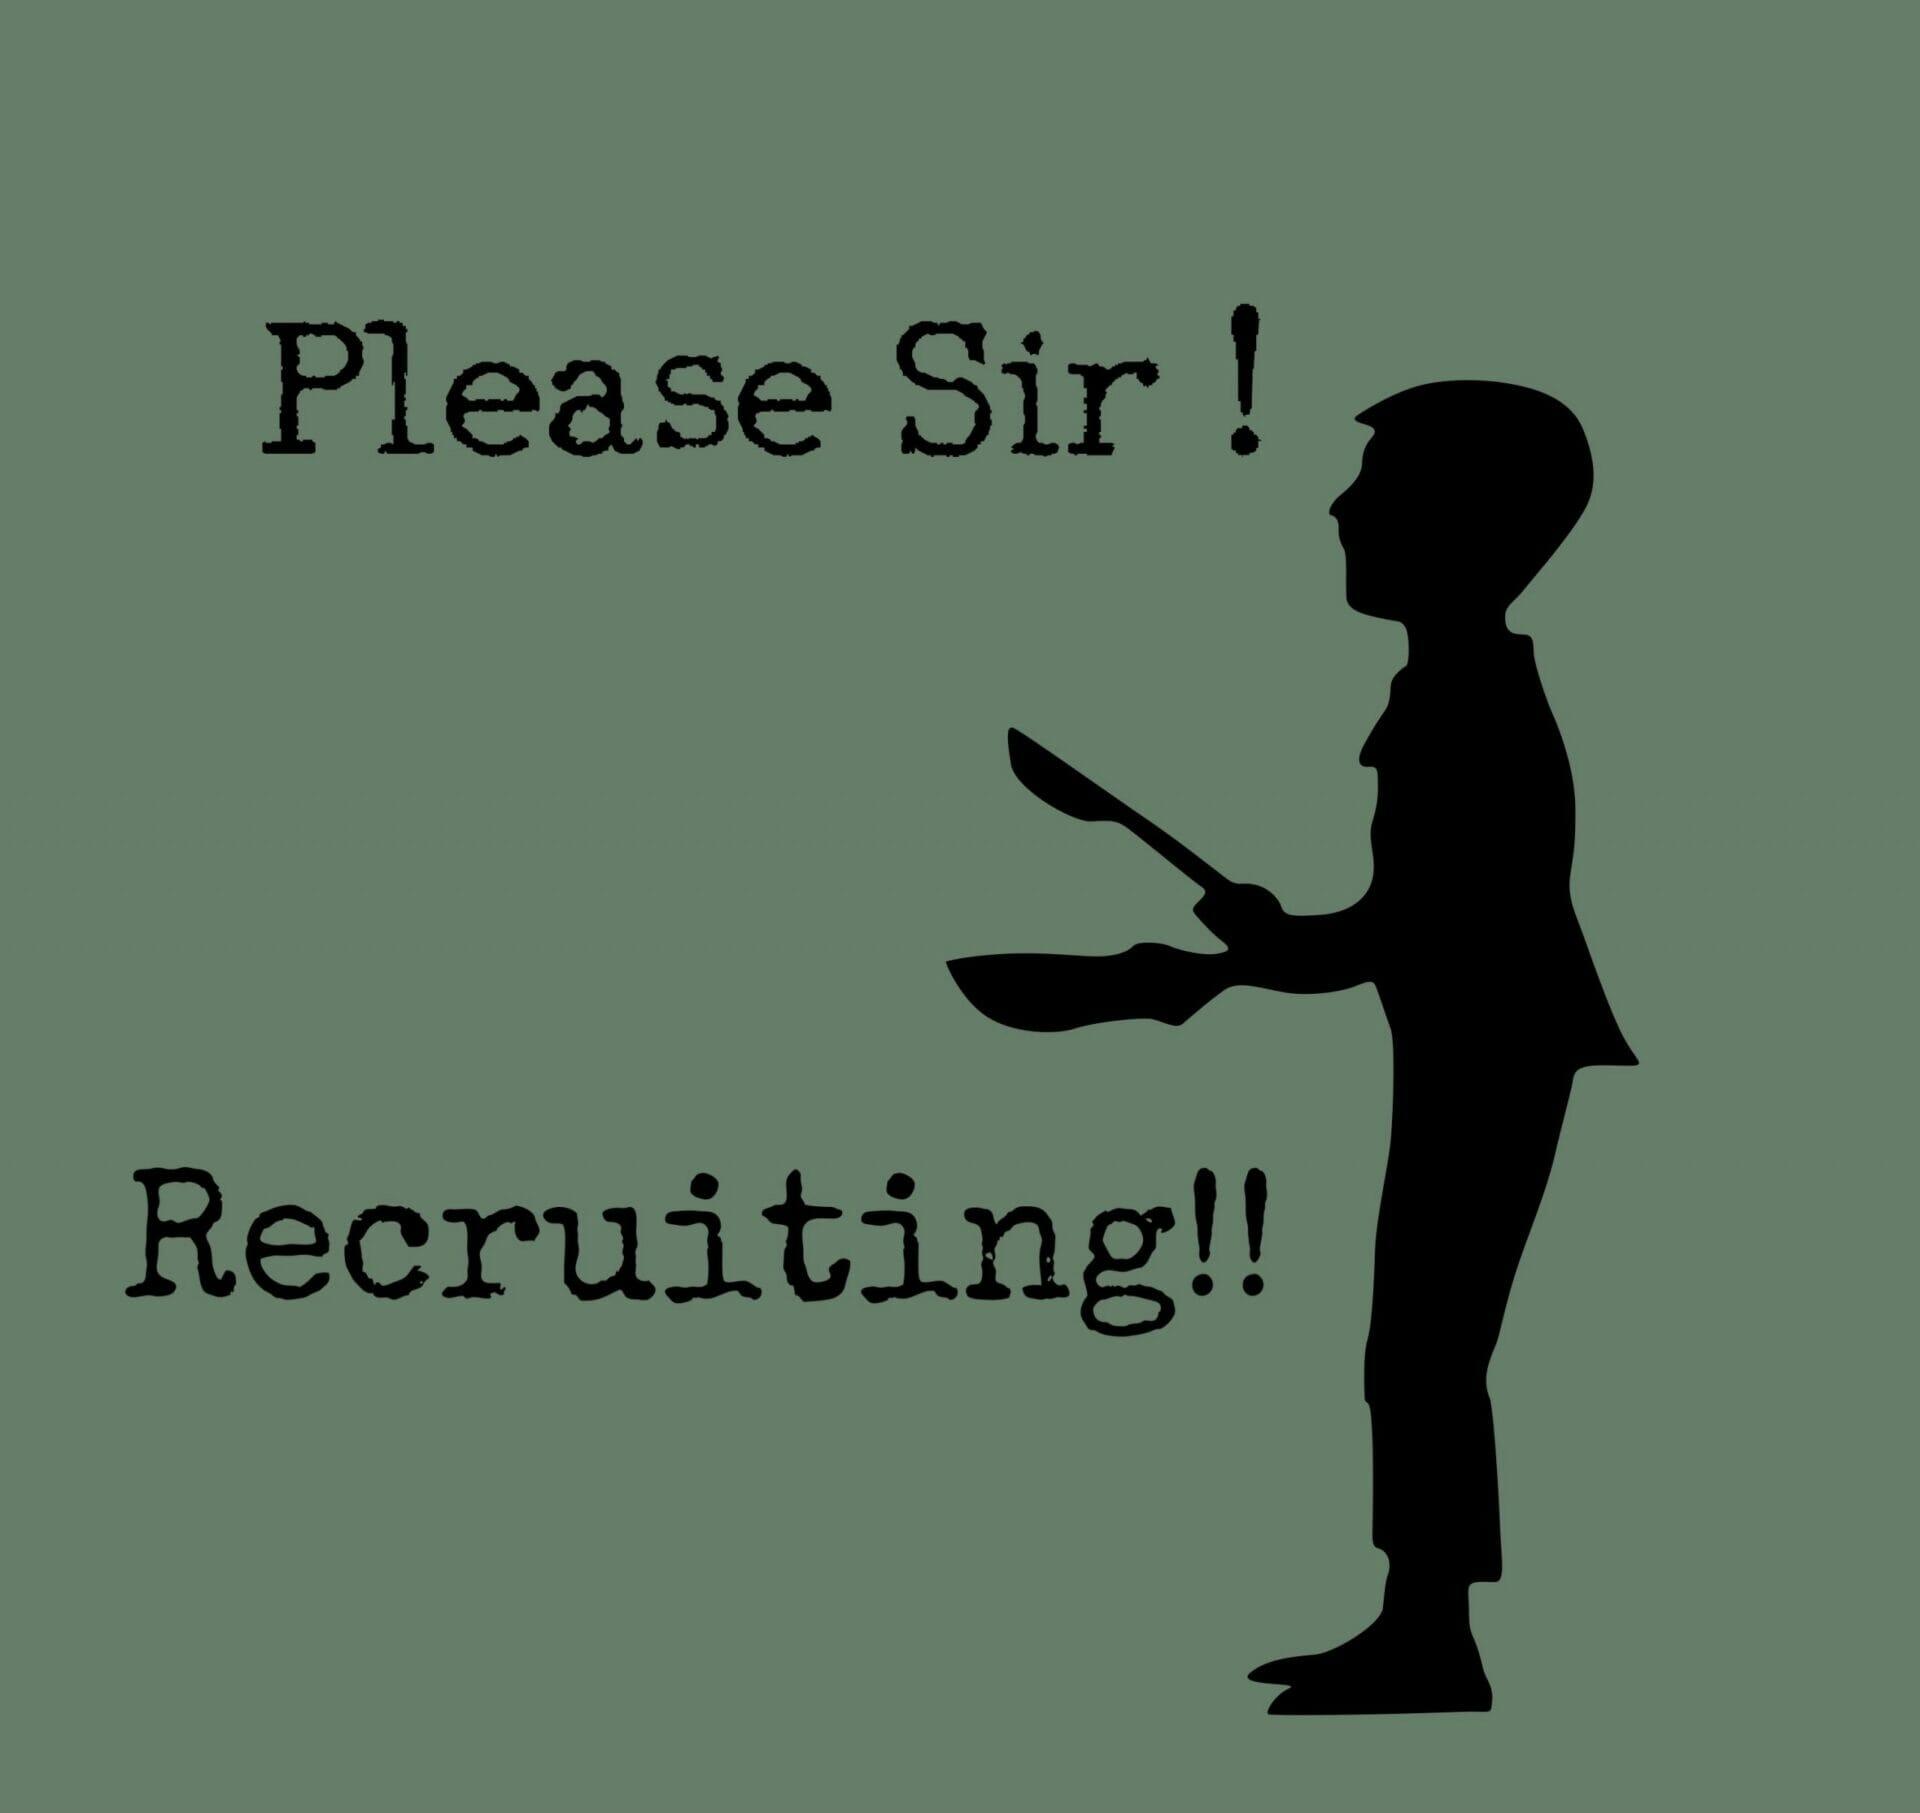 Recruiting!